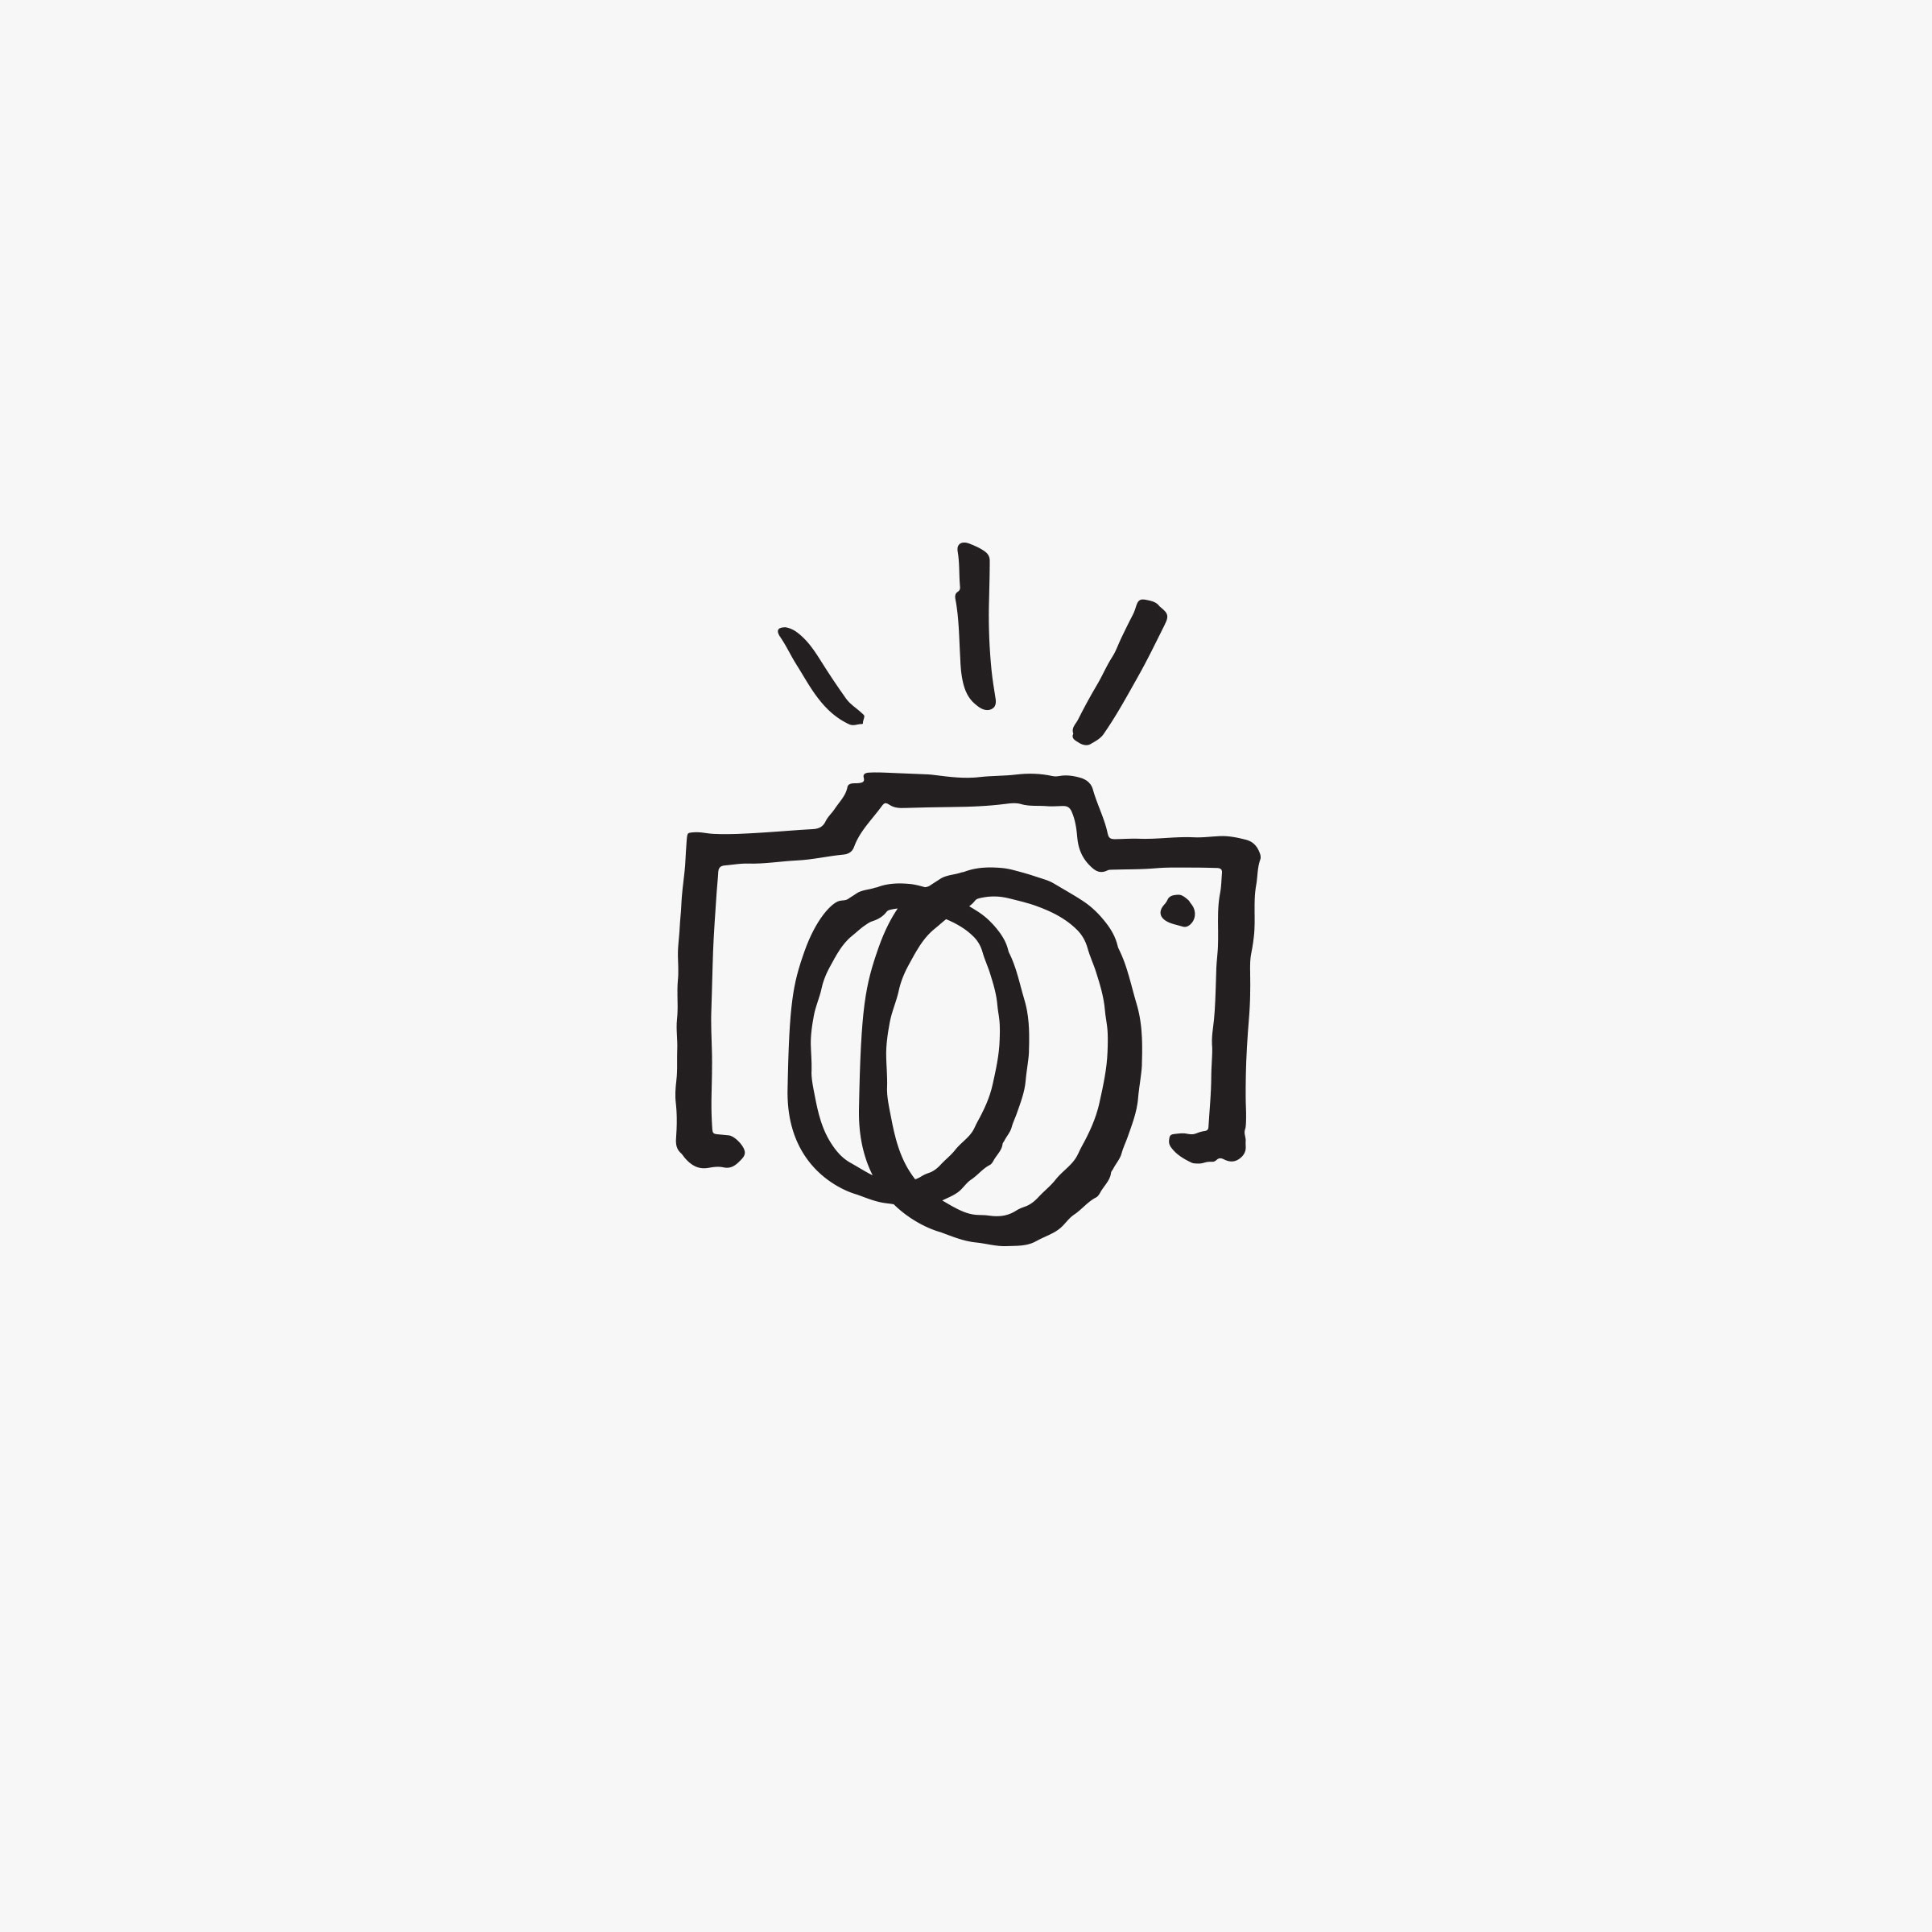 shoot-my-travel-2-logo-design-by-create.jpg